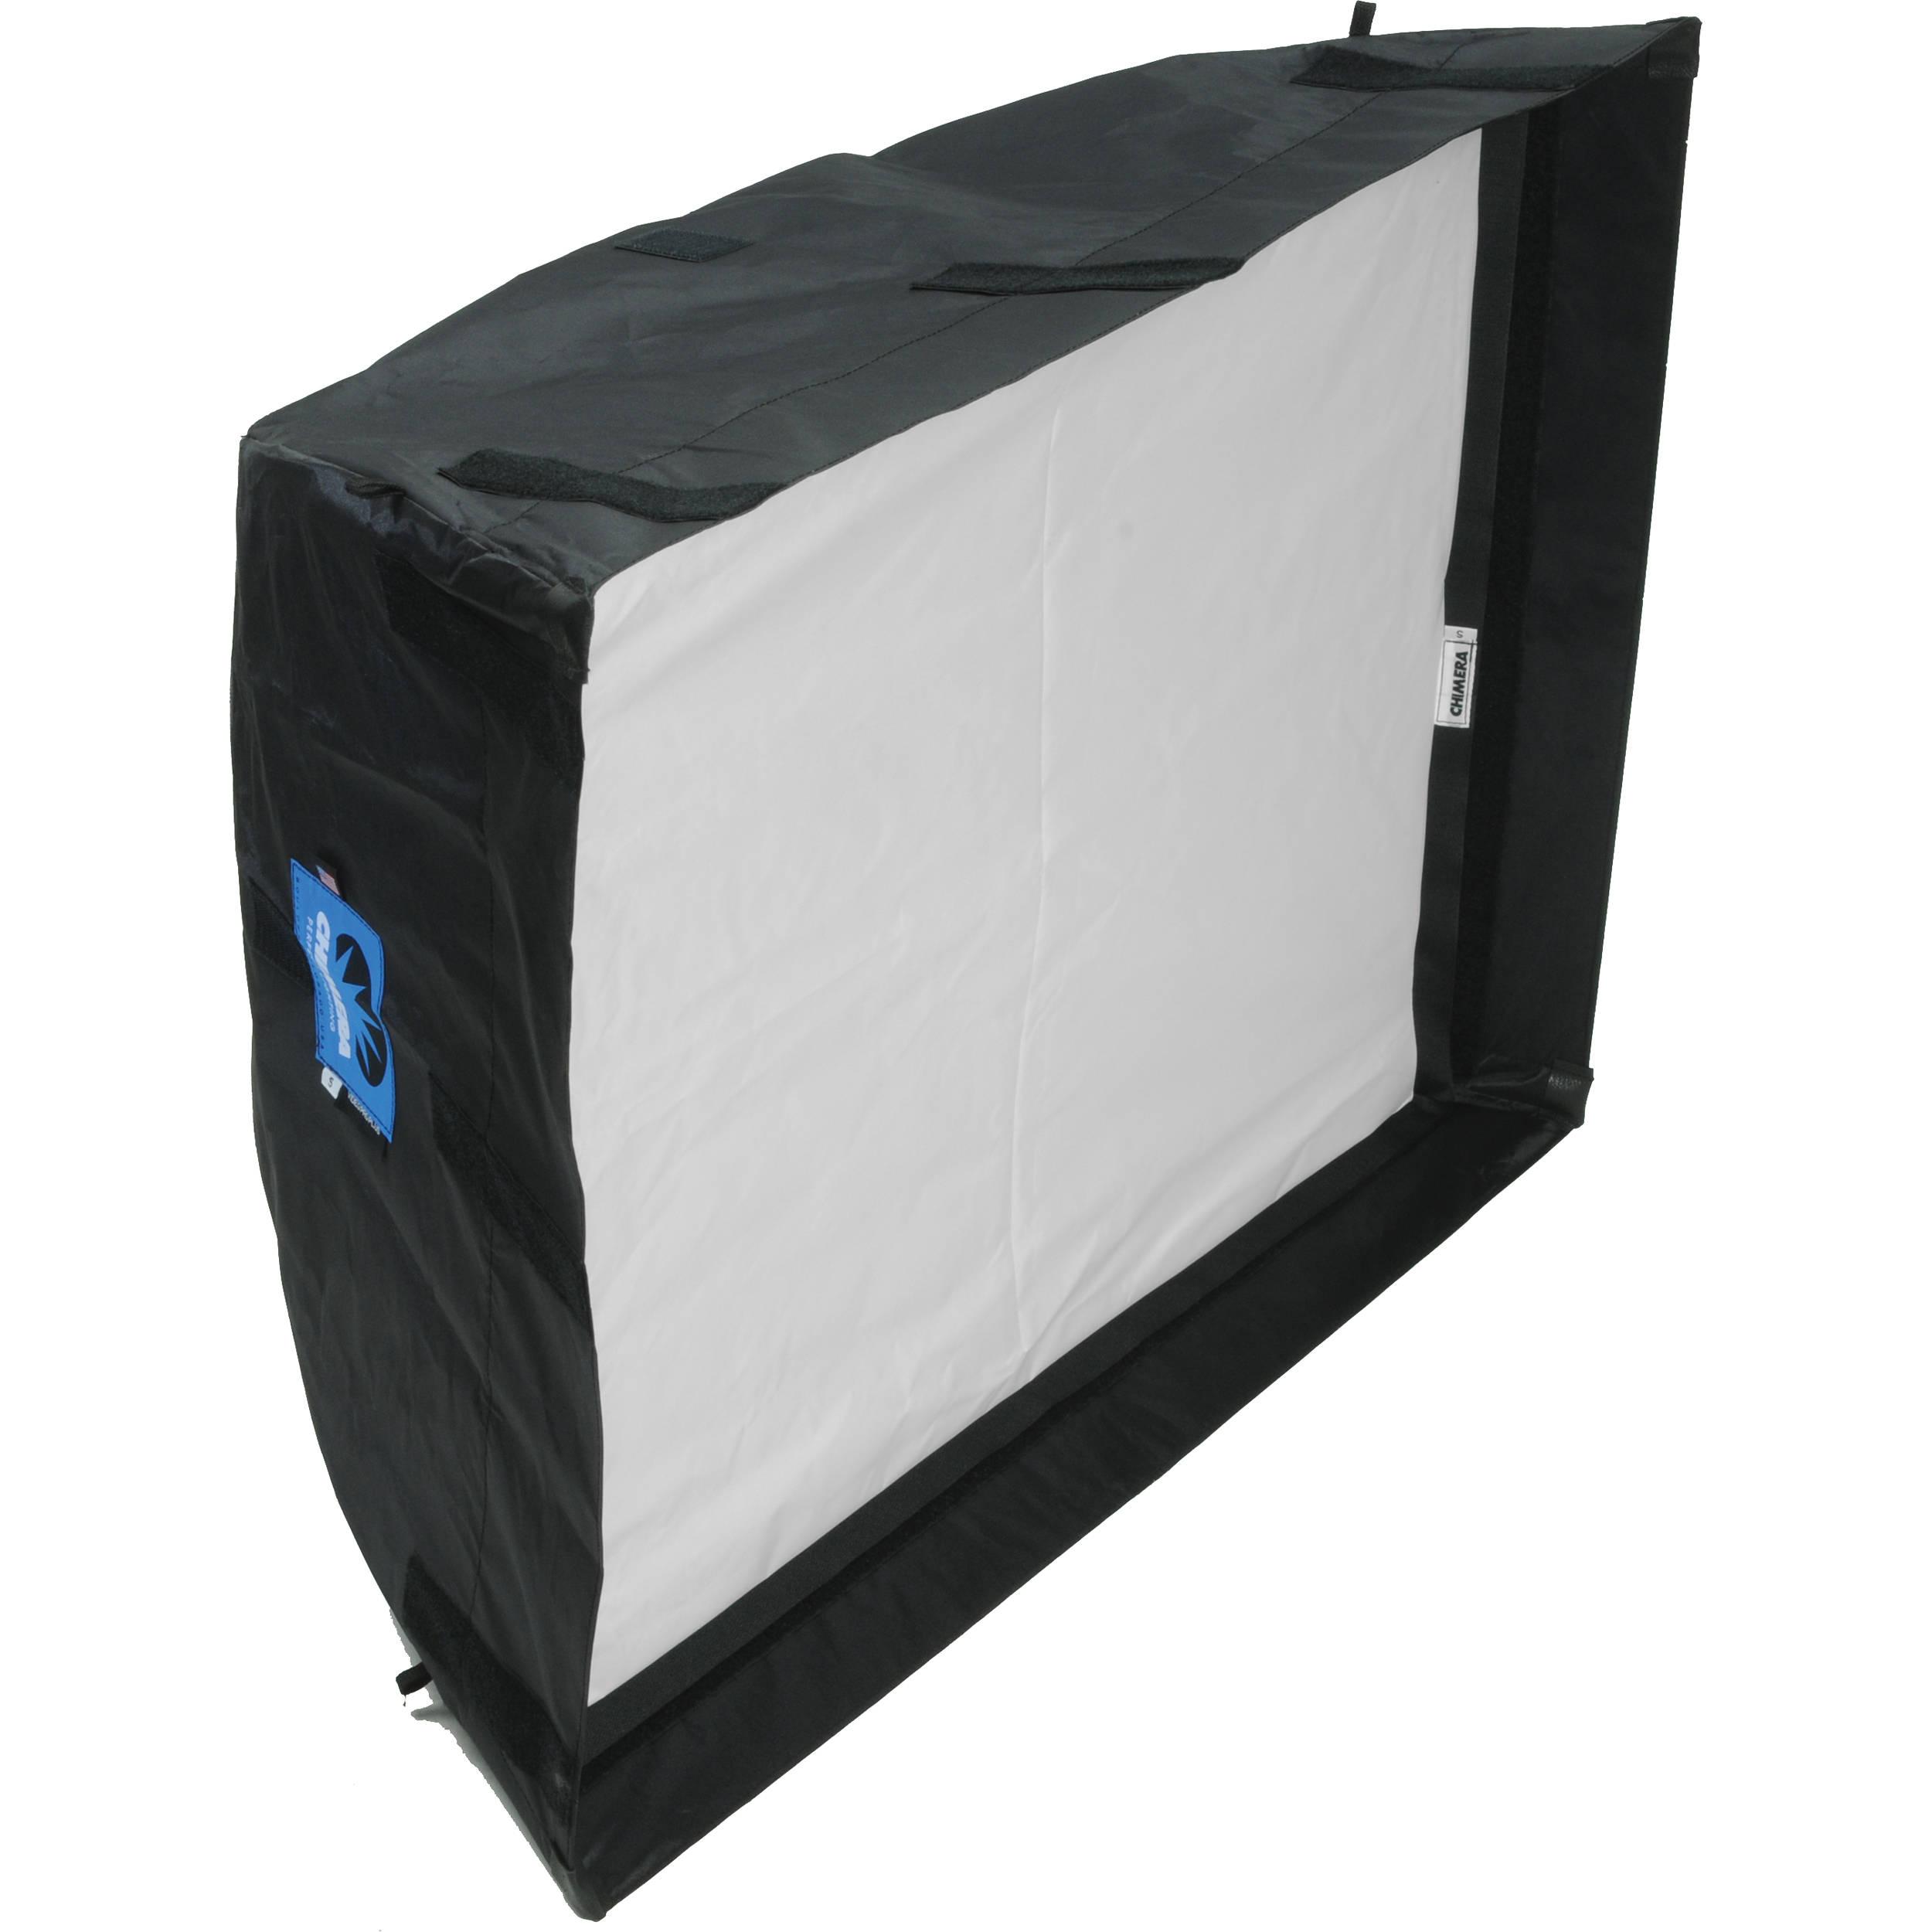 Speed Ring Sold Separately  sc 1 st  Bu0026H & Chimera Video Pro Plus Softbox - Medium 36x48